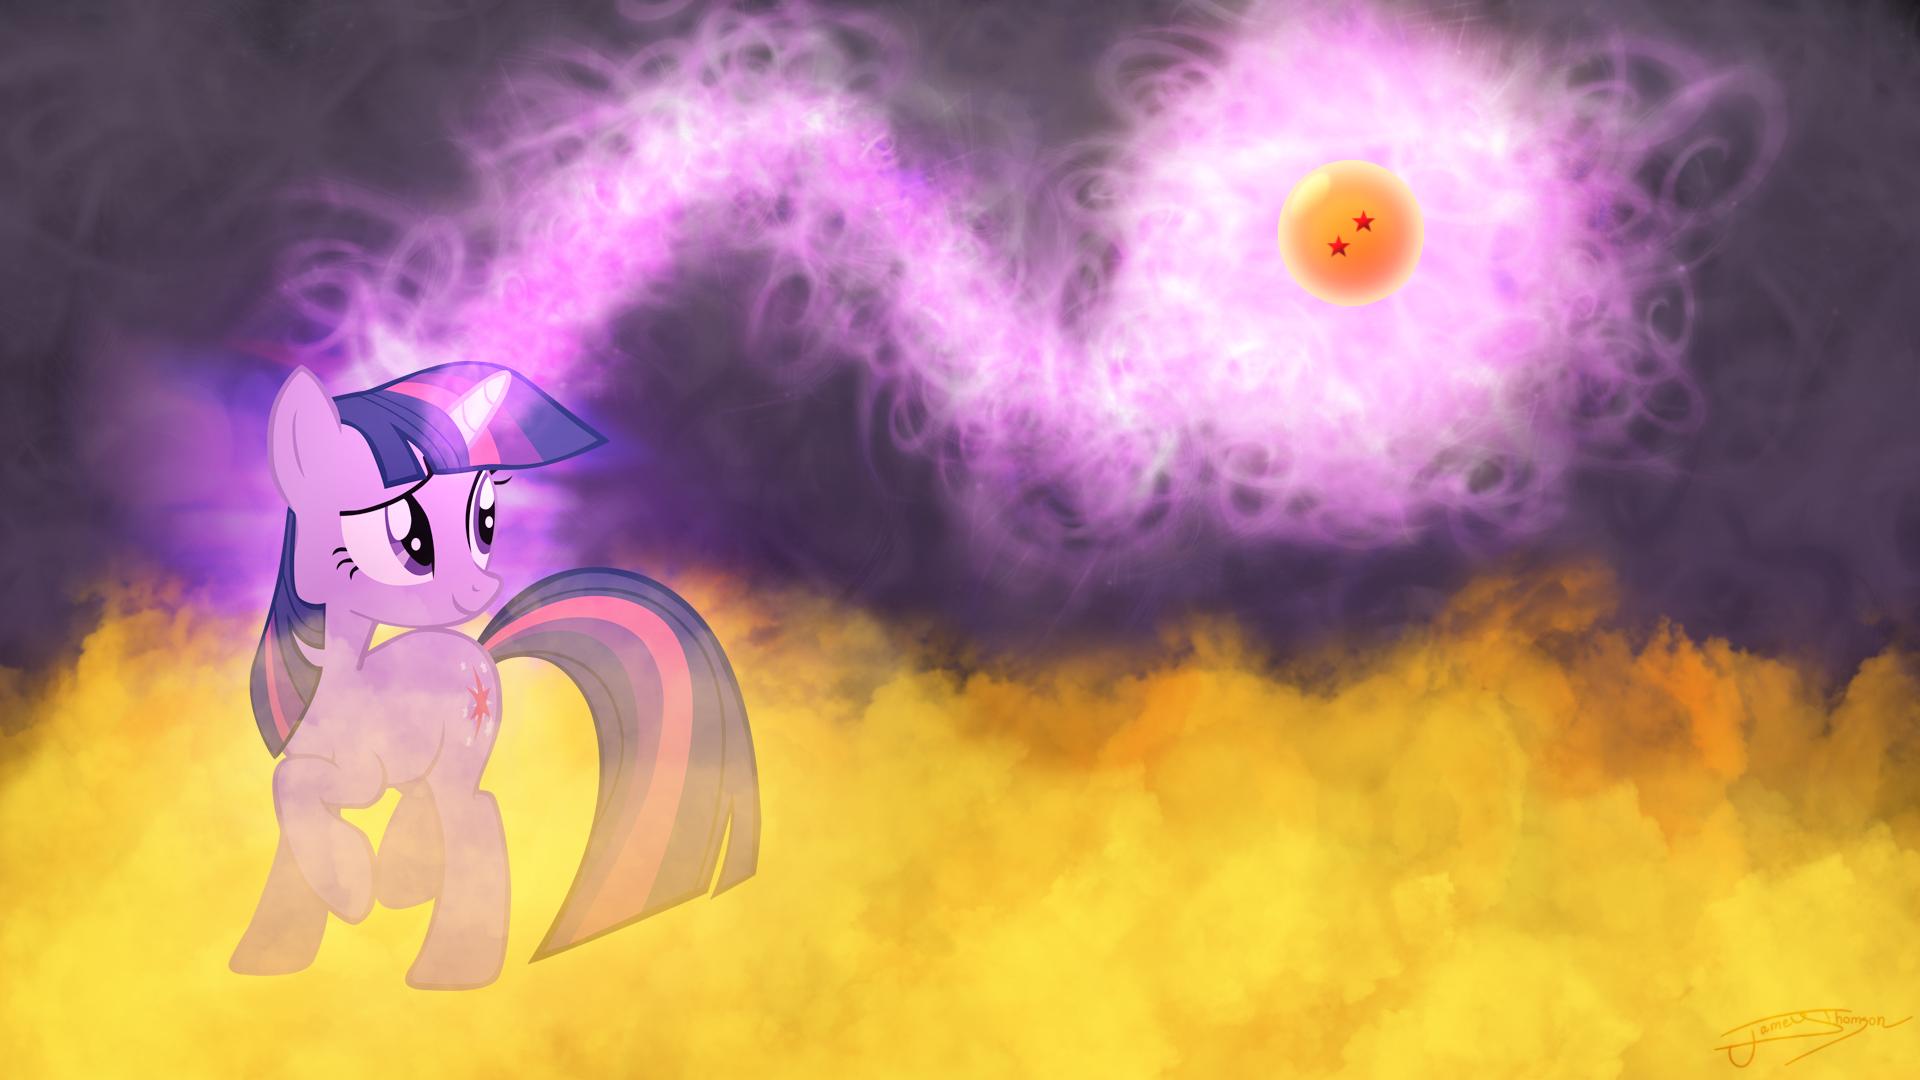 Twilight Sparkle - 2 Star Dragonball by Jamey4